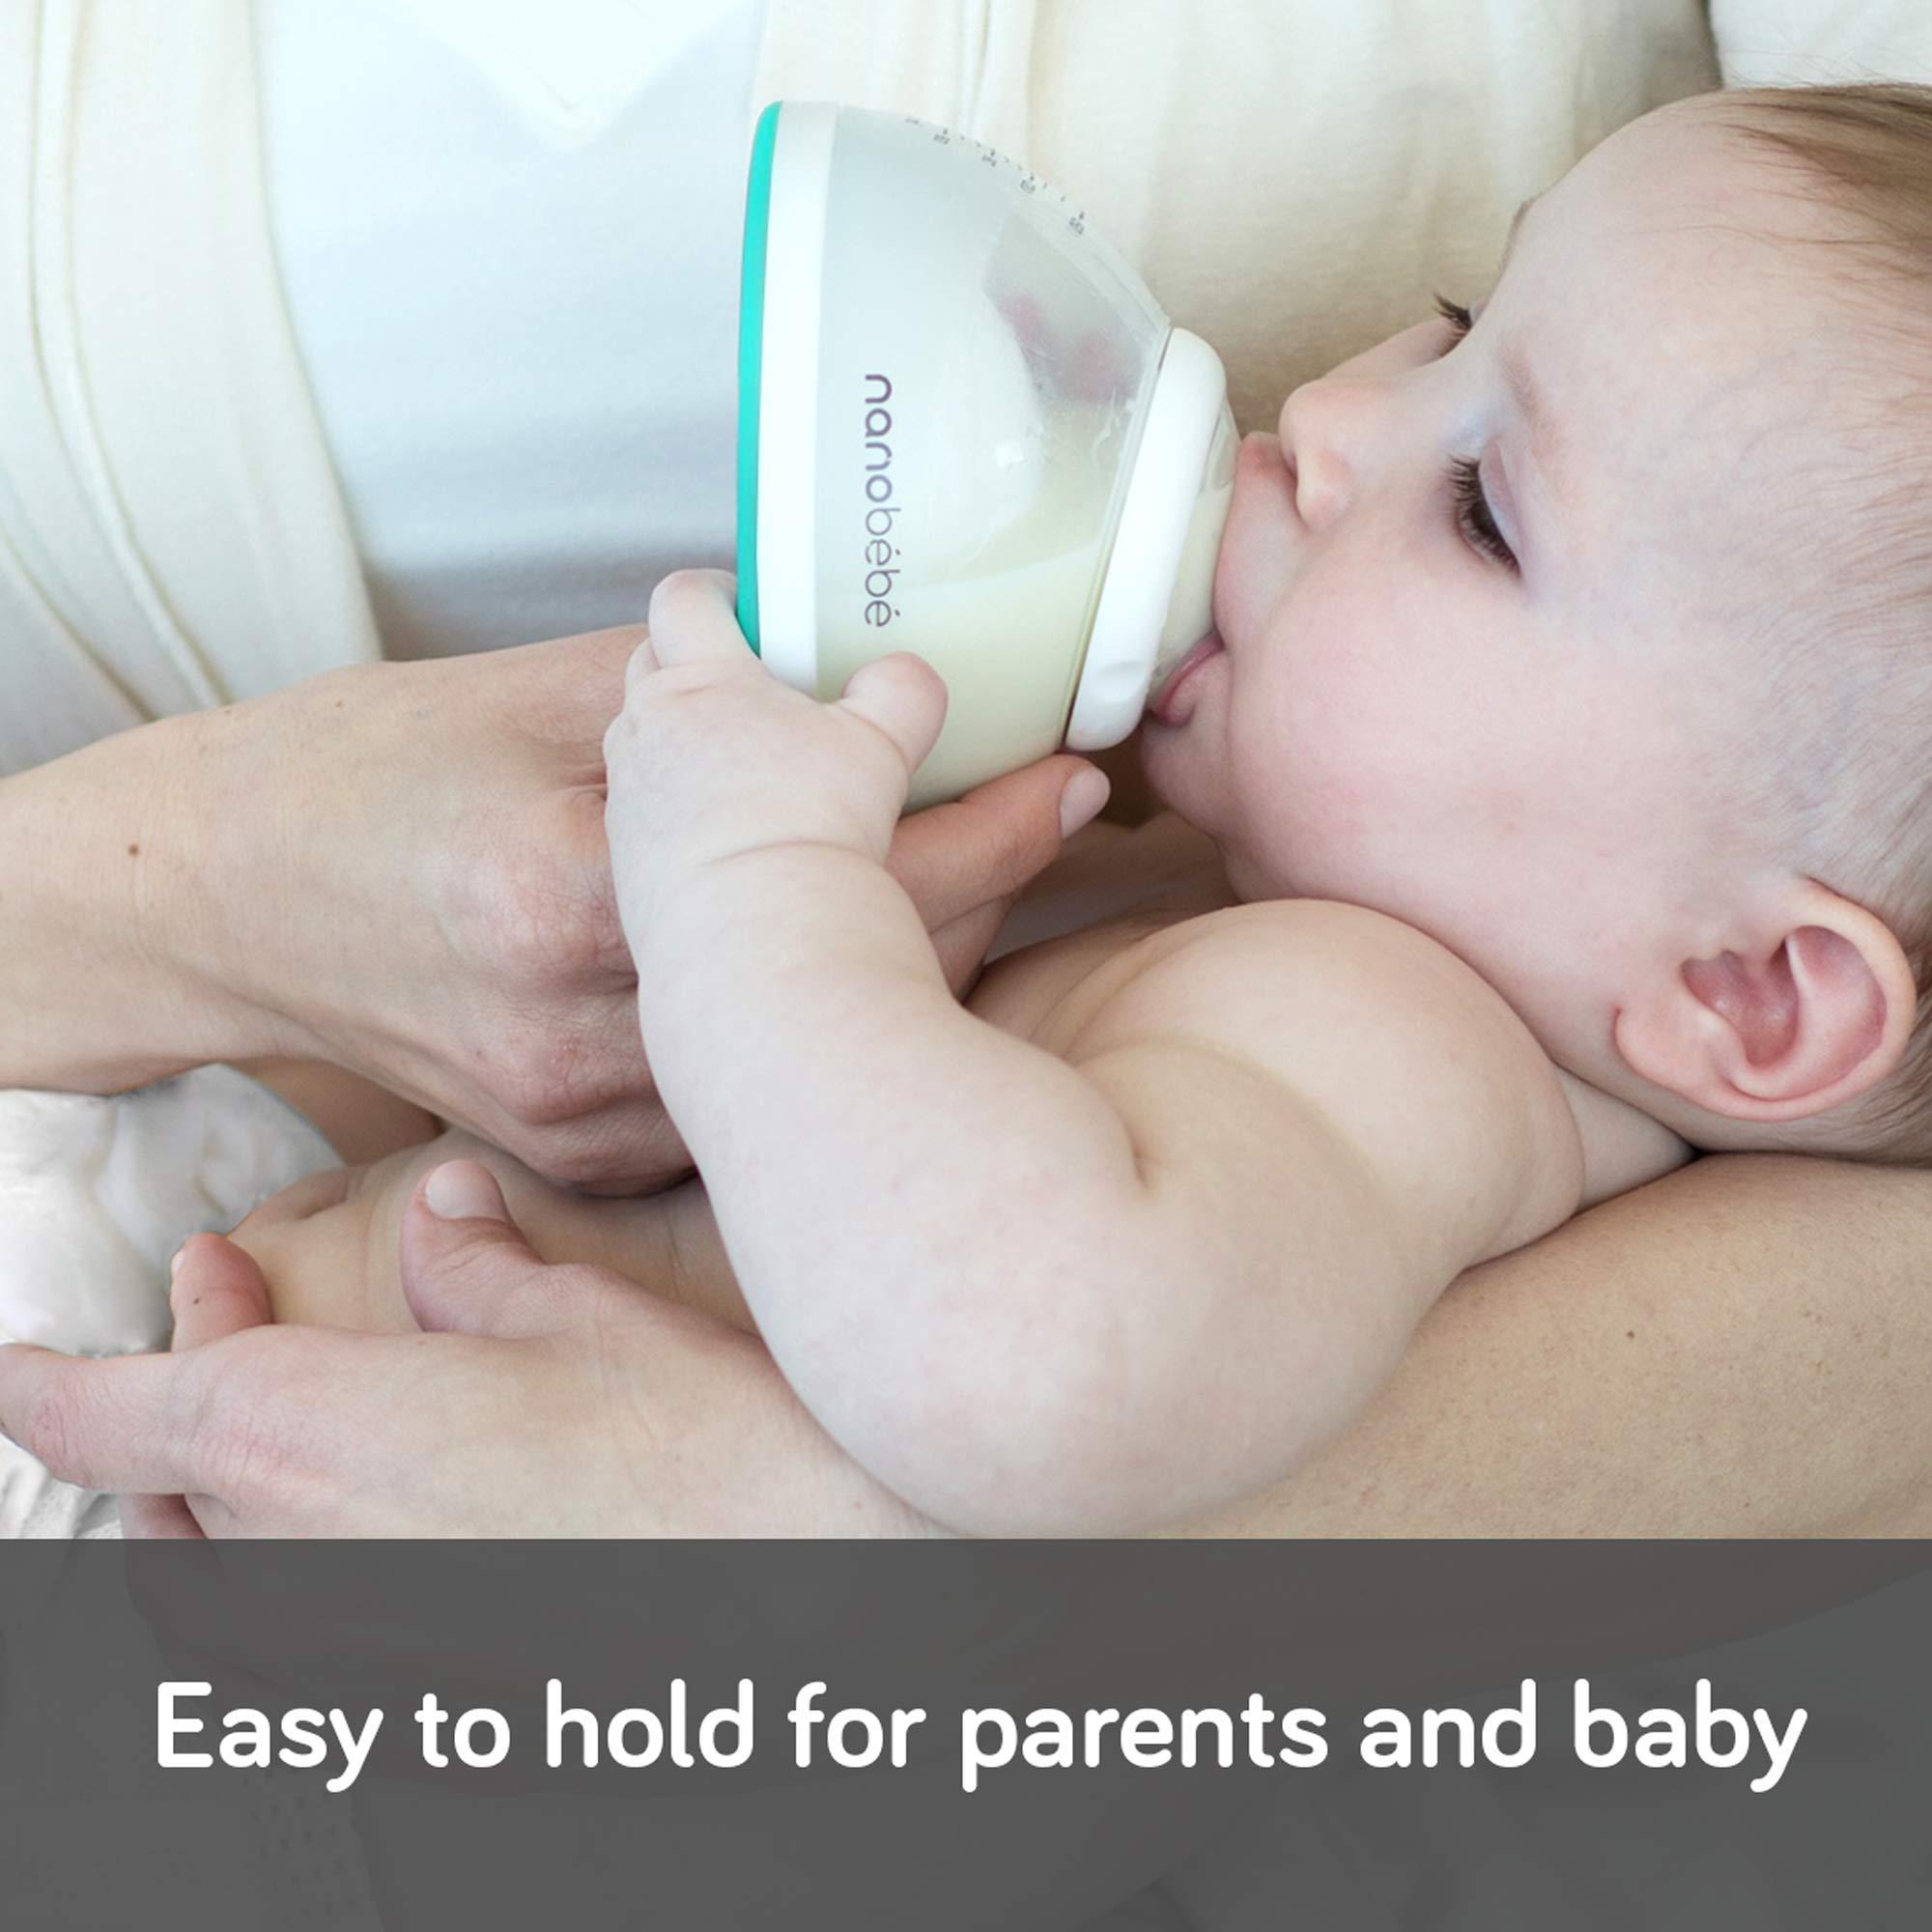 nanobébé Newborn Breastfeeding Bottles & Sterilization Kit – Anti Colic Baby Bottle Starter Set with Warming Bowl, Steam Sterilizer, Drying Rack, & Pacifiers – Top Registry Gift Set by NANOBÉBÉ (Image #3)